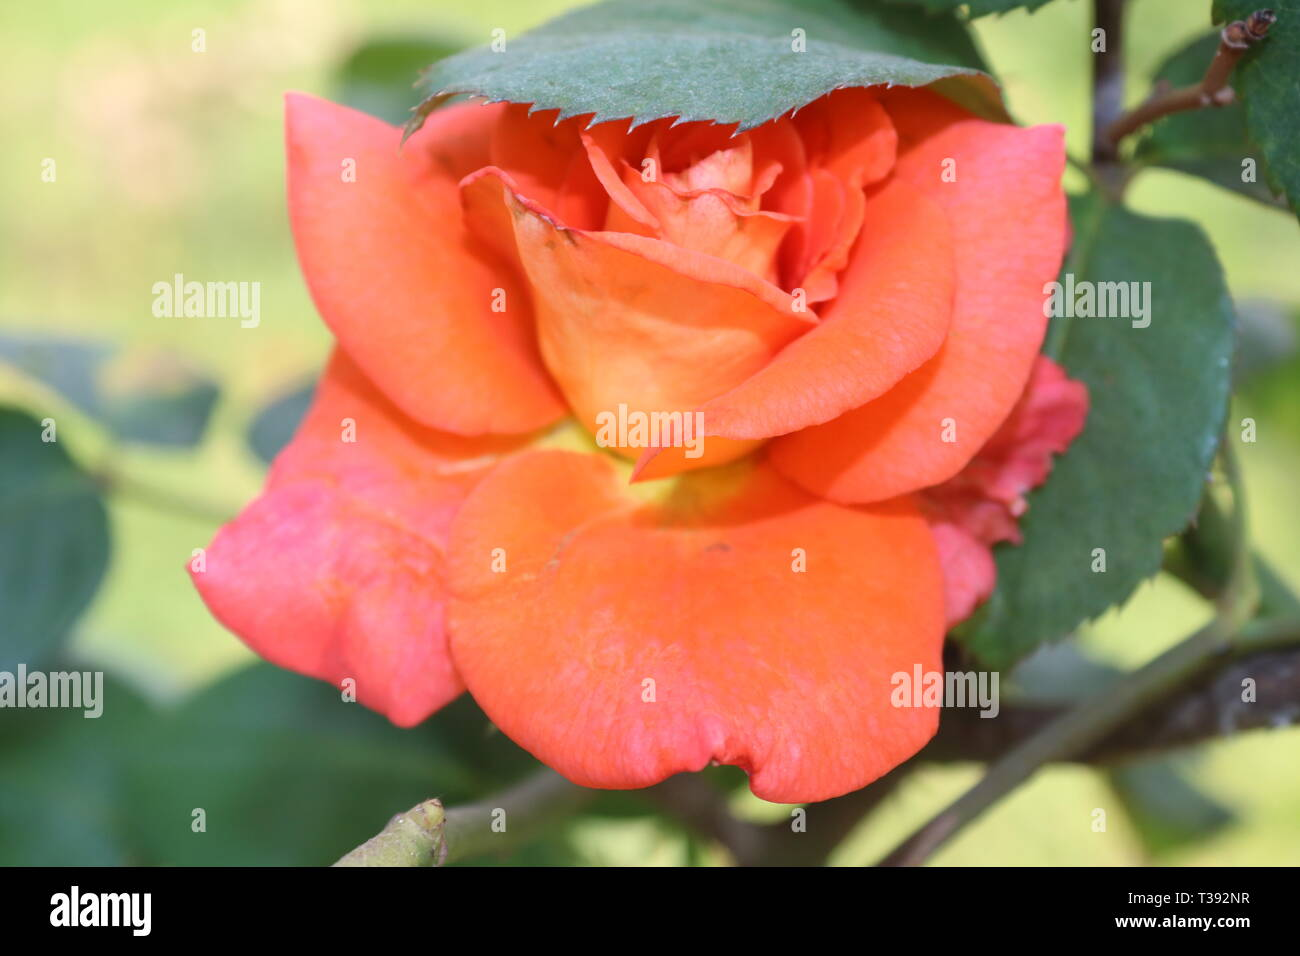 Pink color rose flower - Stock Image